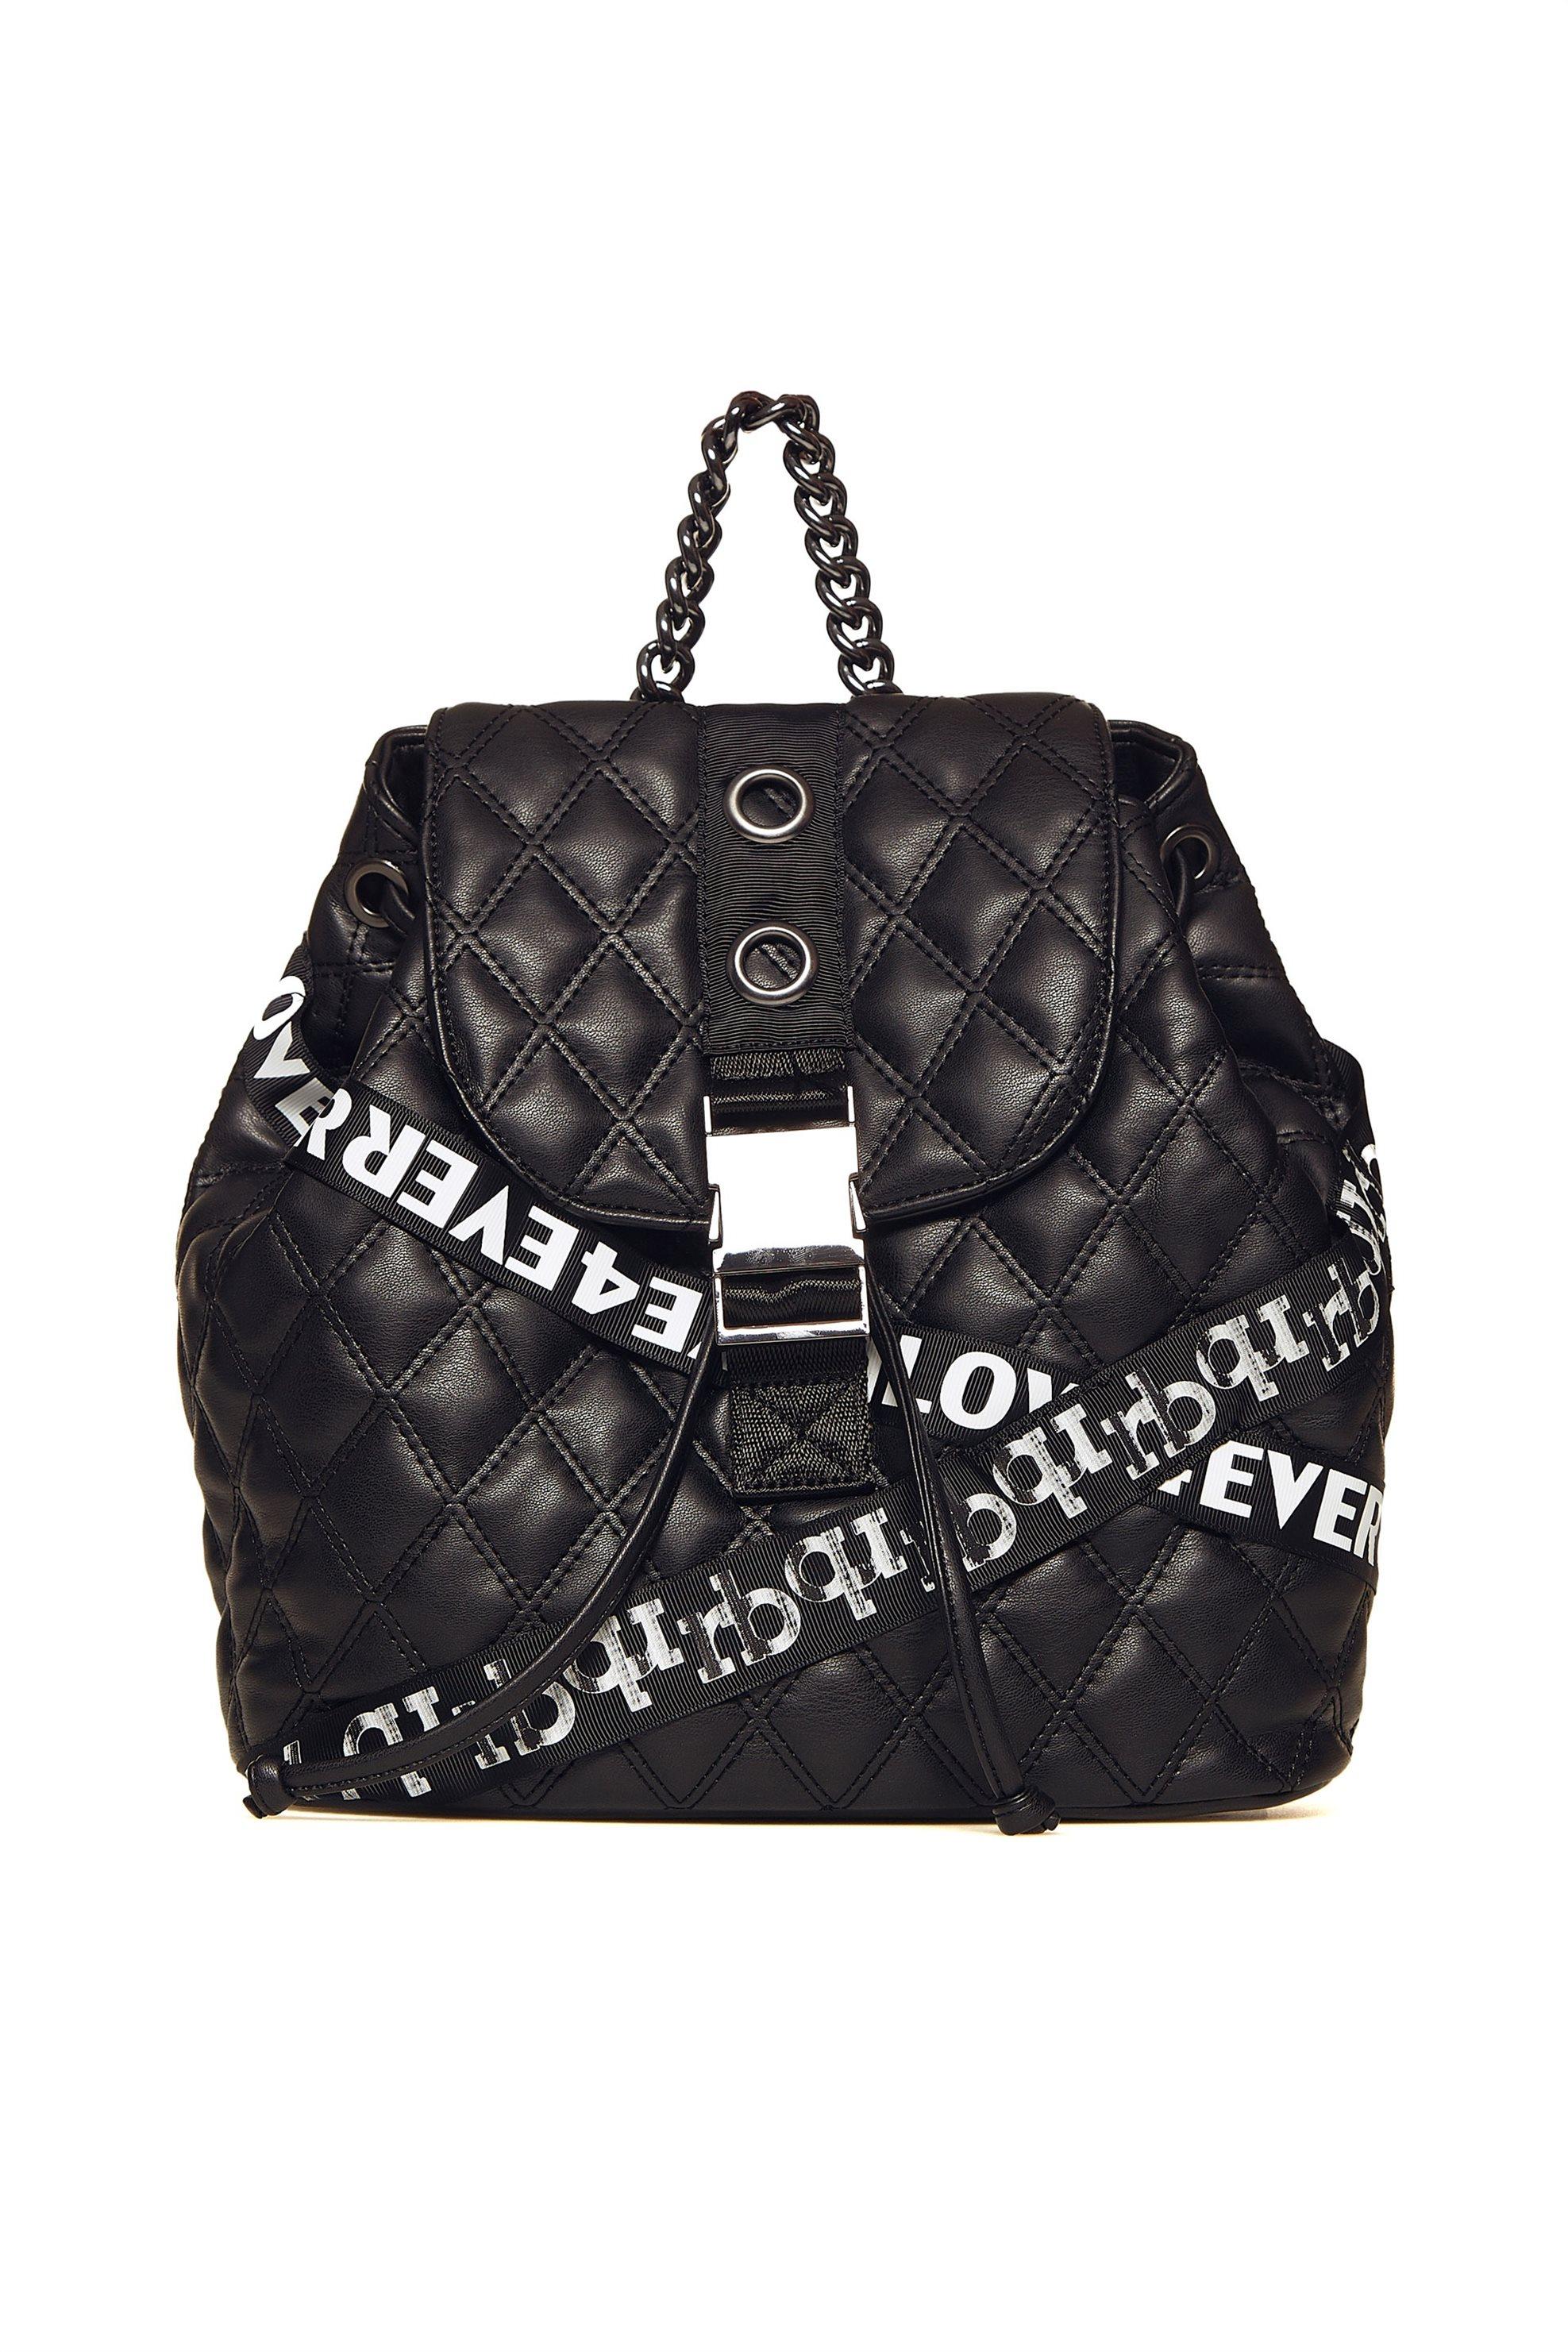 c61f9cac76 Notos Roccobarocco γυναικείο backpack καπιτονέ με ριγέ λουρί και τρέσες -  01GRBBS18O03  FO - Μαύρο